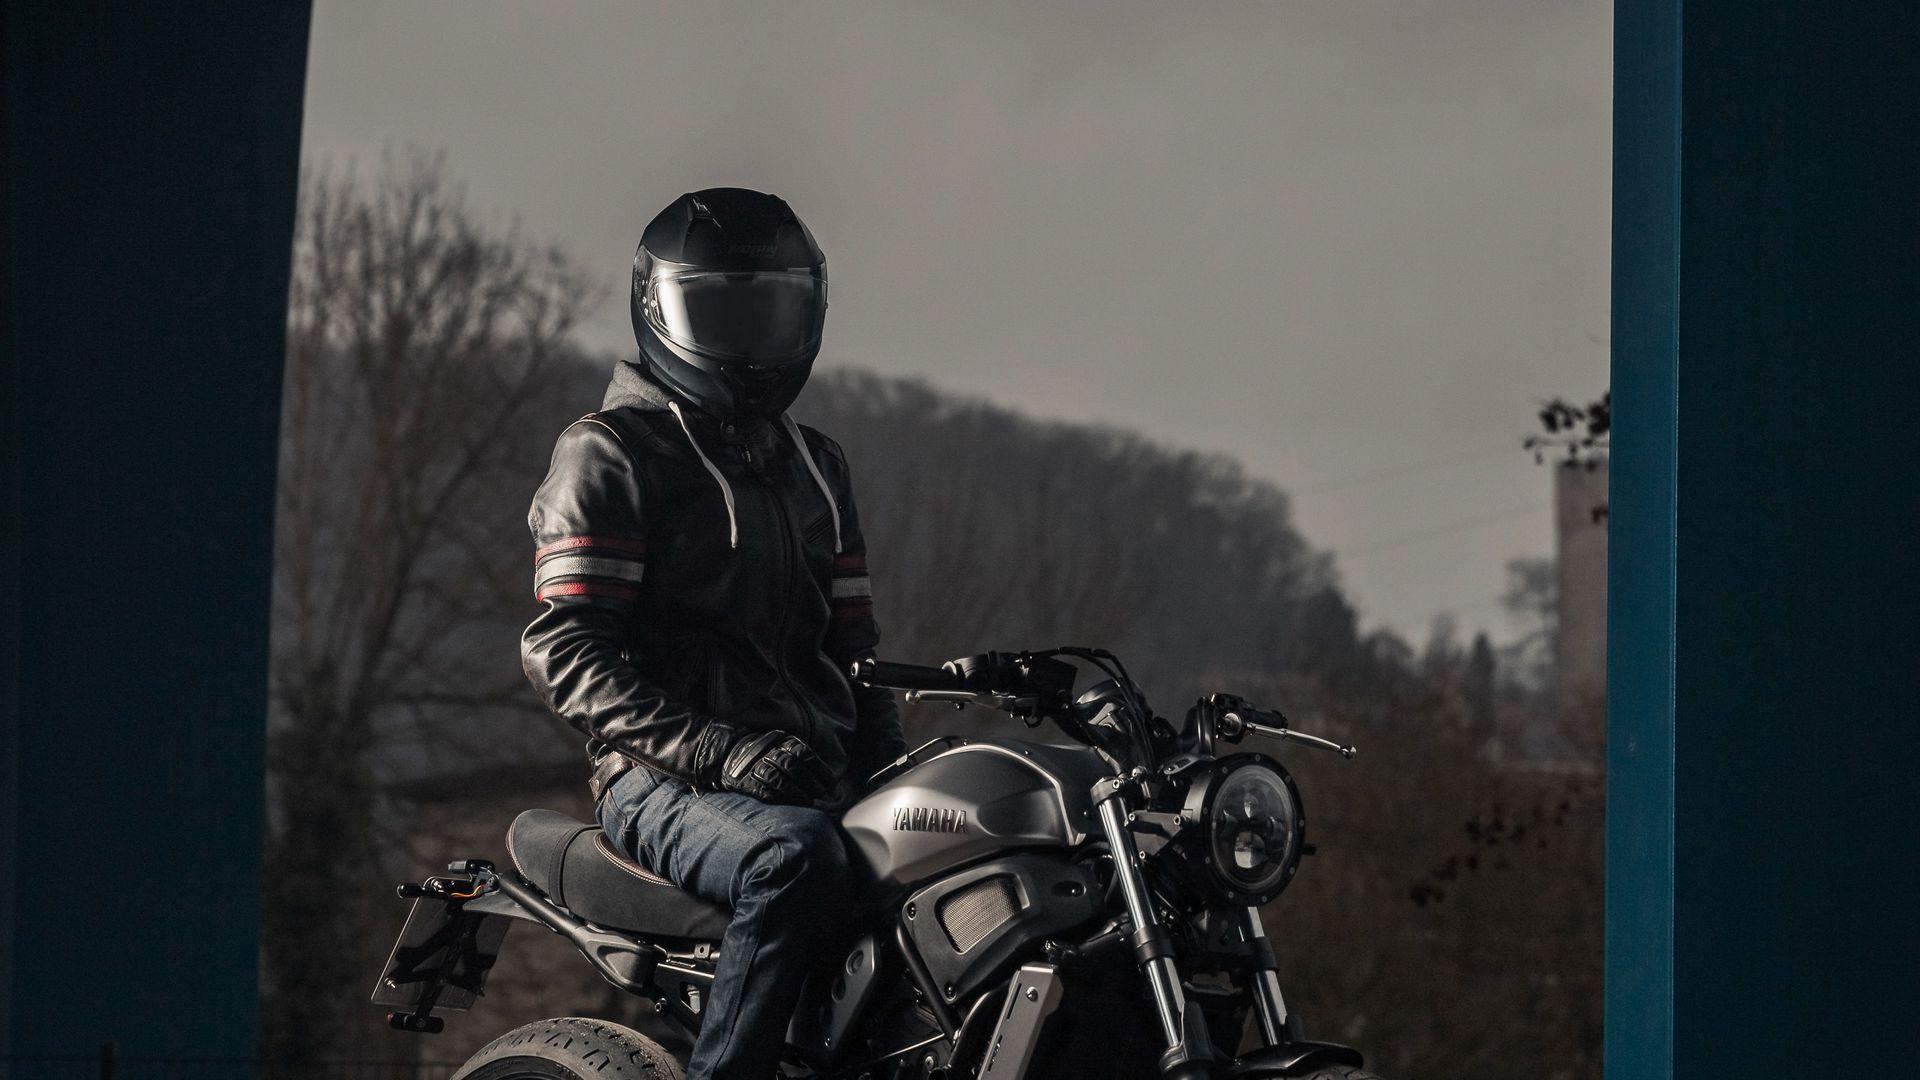 Motorcyclist, Helmet, Motorcycle Download Free HD Wallpapers